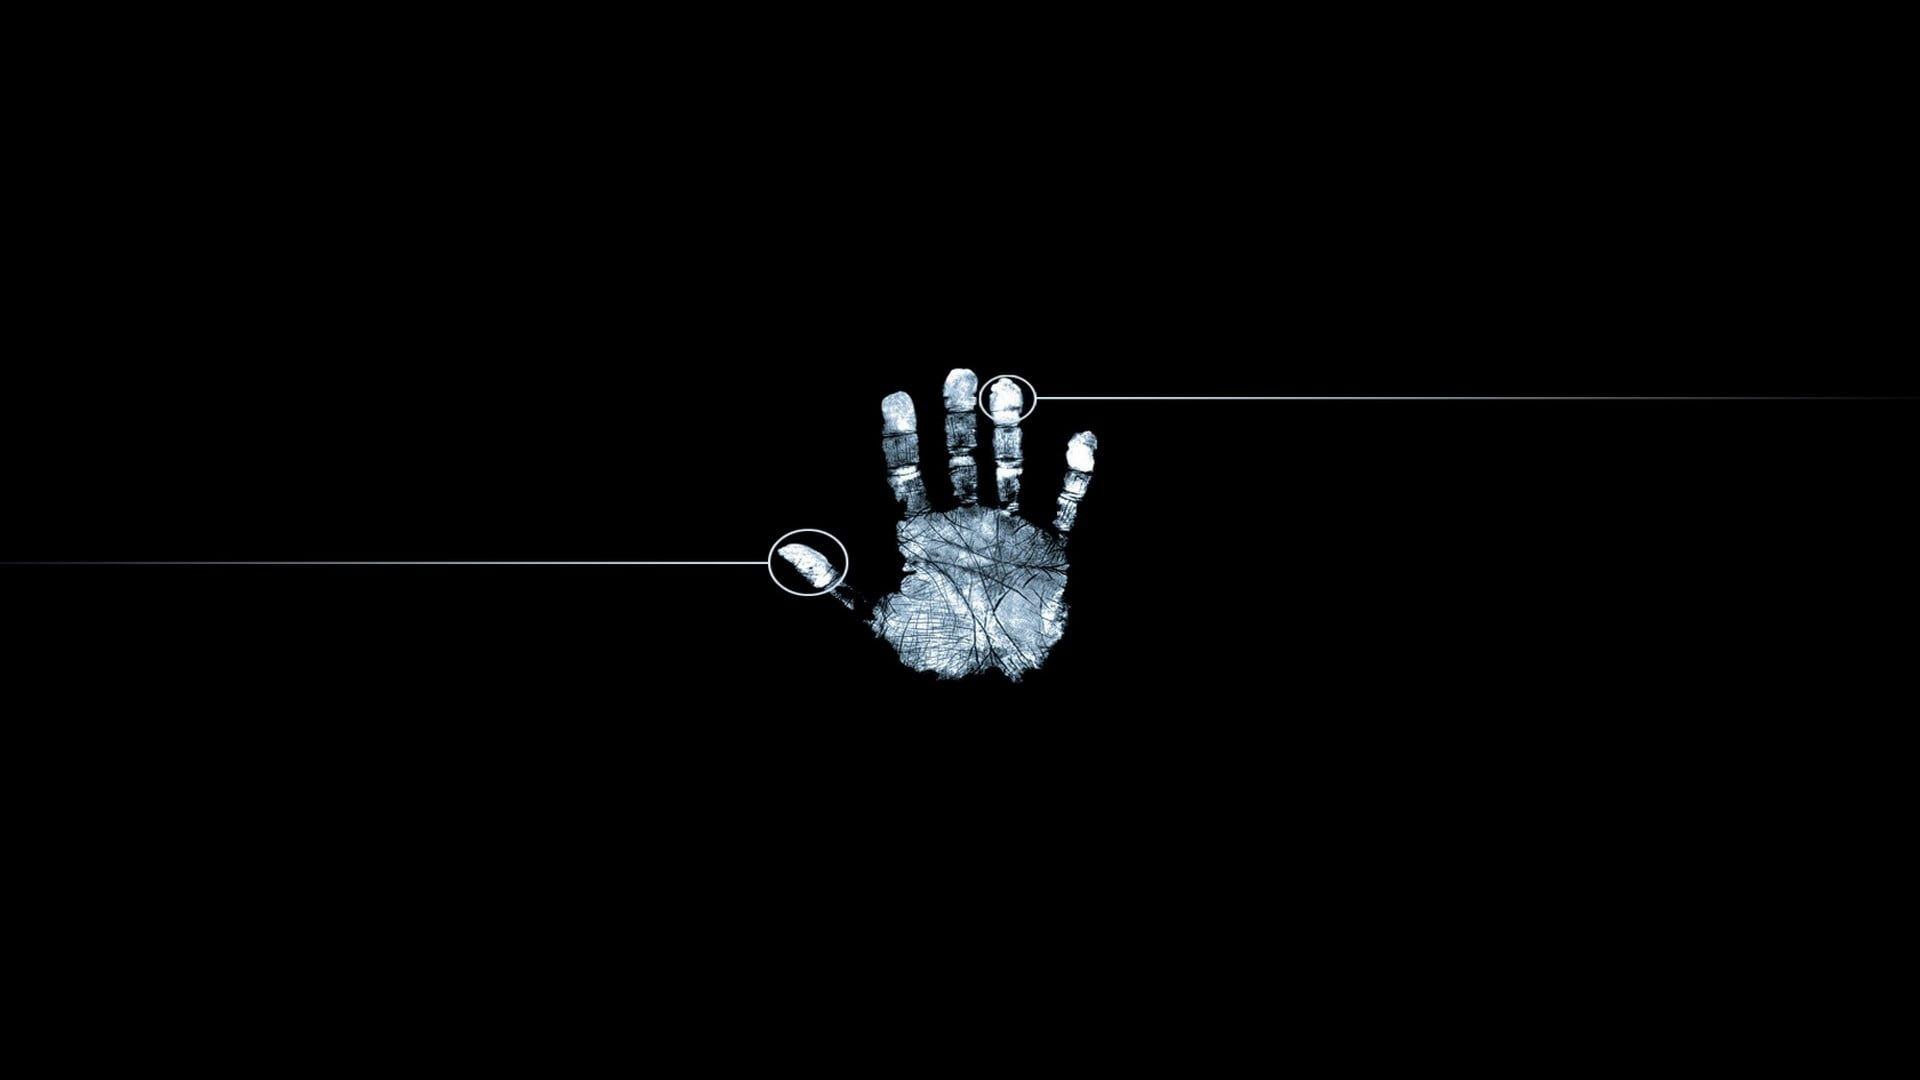 Minimalism Black Background Fingerprints White Abstract Hands Fingers Monochrome Handpr Desktop Wallpaper Black Pure Black Wallpaper Hd Dark Wallpapers